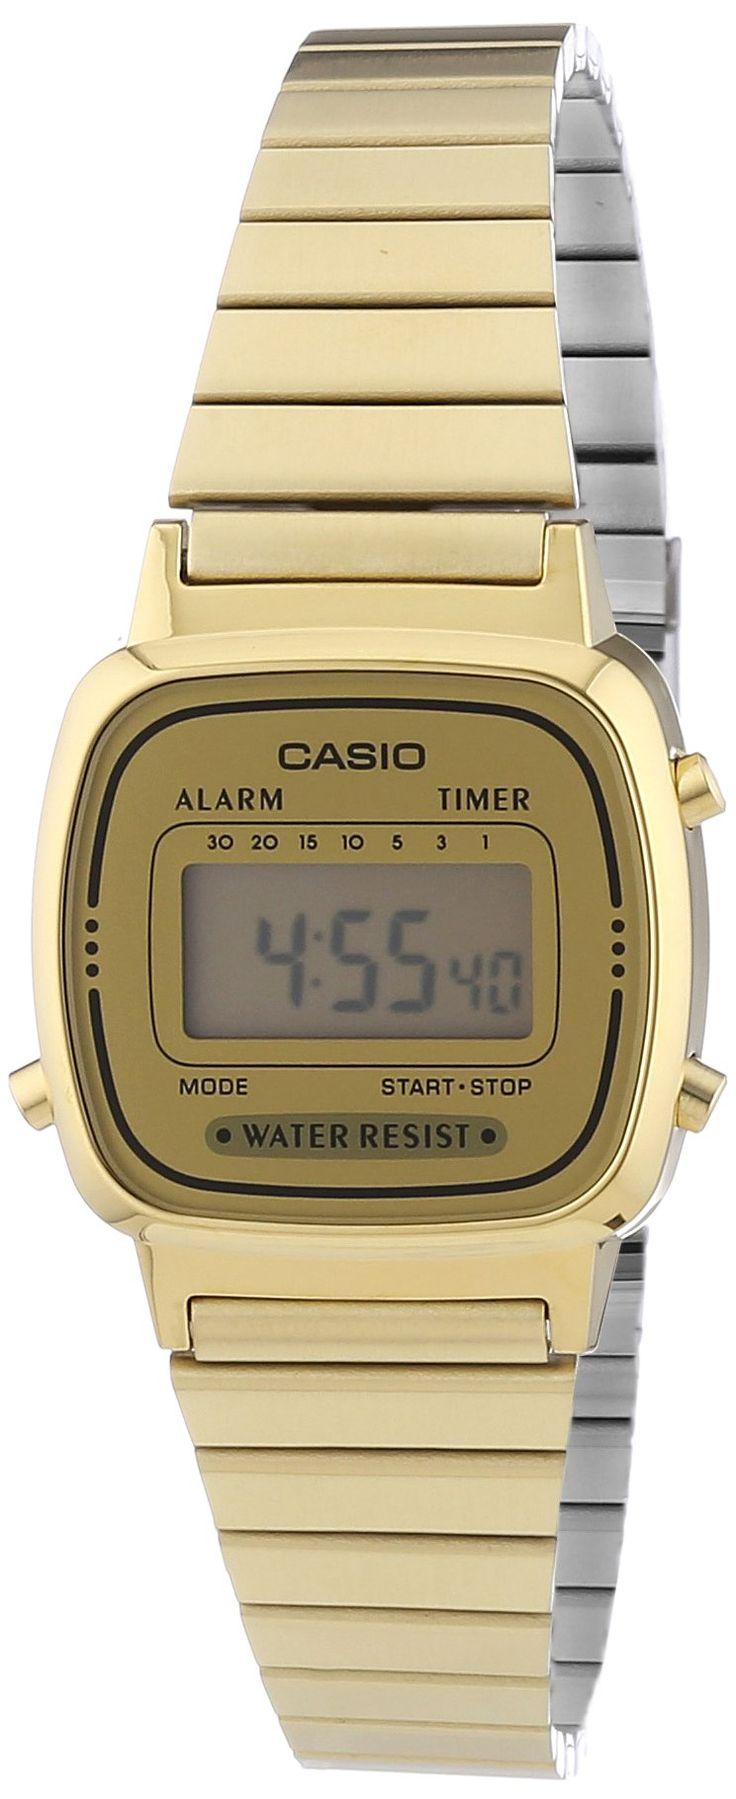 Casio En Relojes Casio Relojes Casio Aliexpress En Aliexpress Relojes ywNnOP80vm